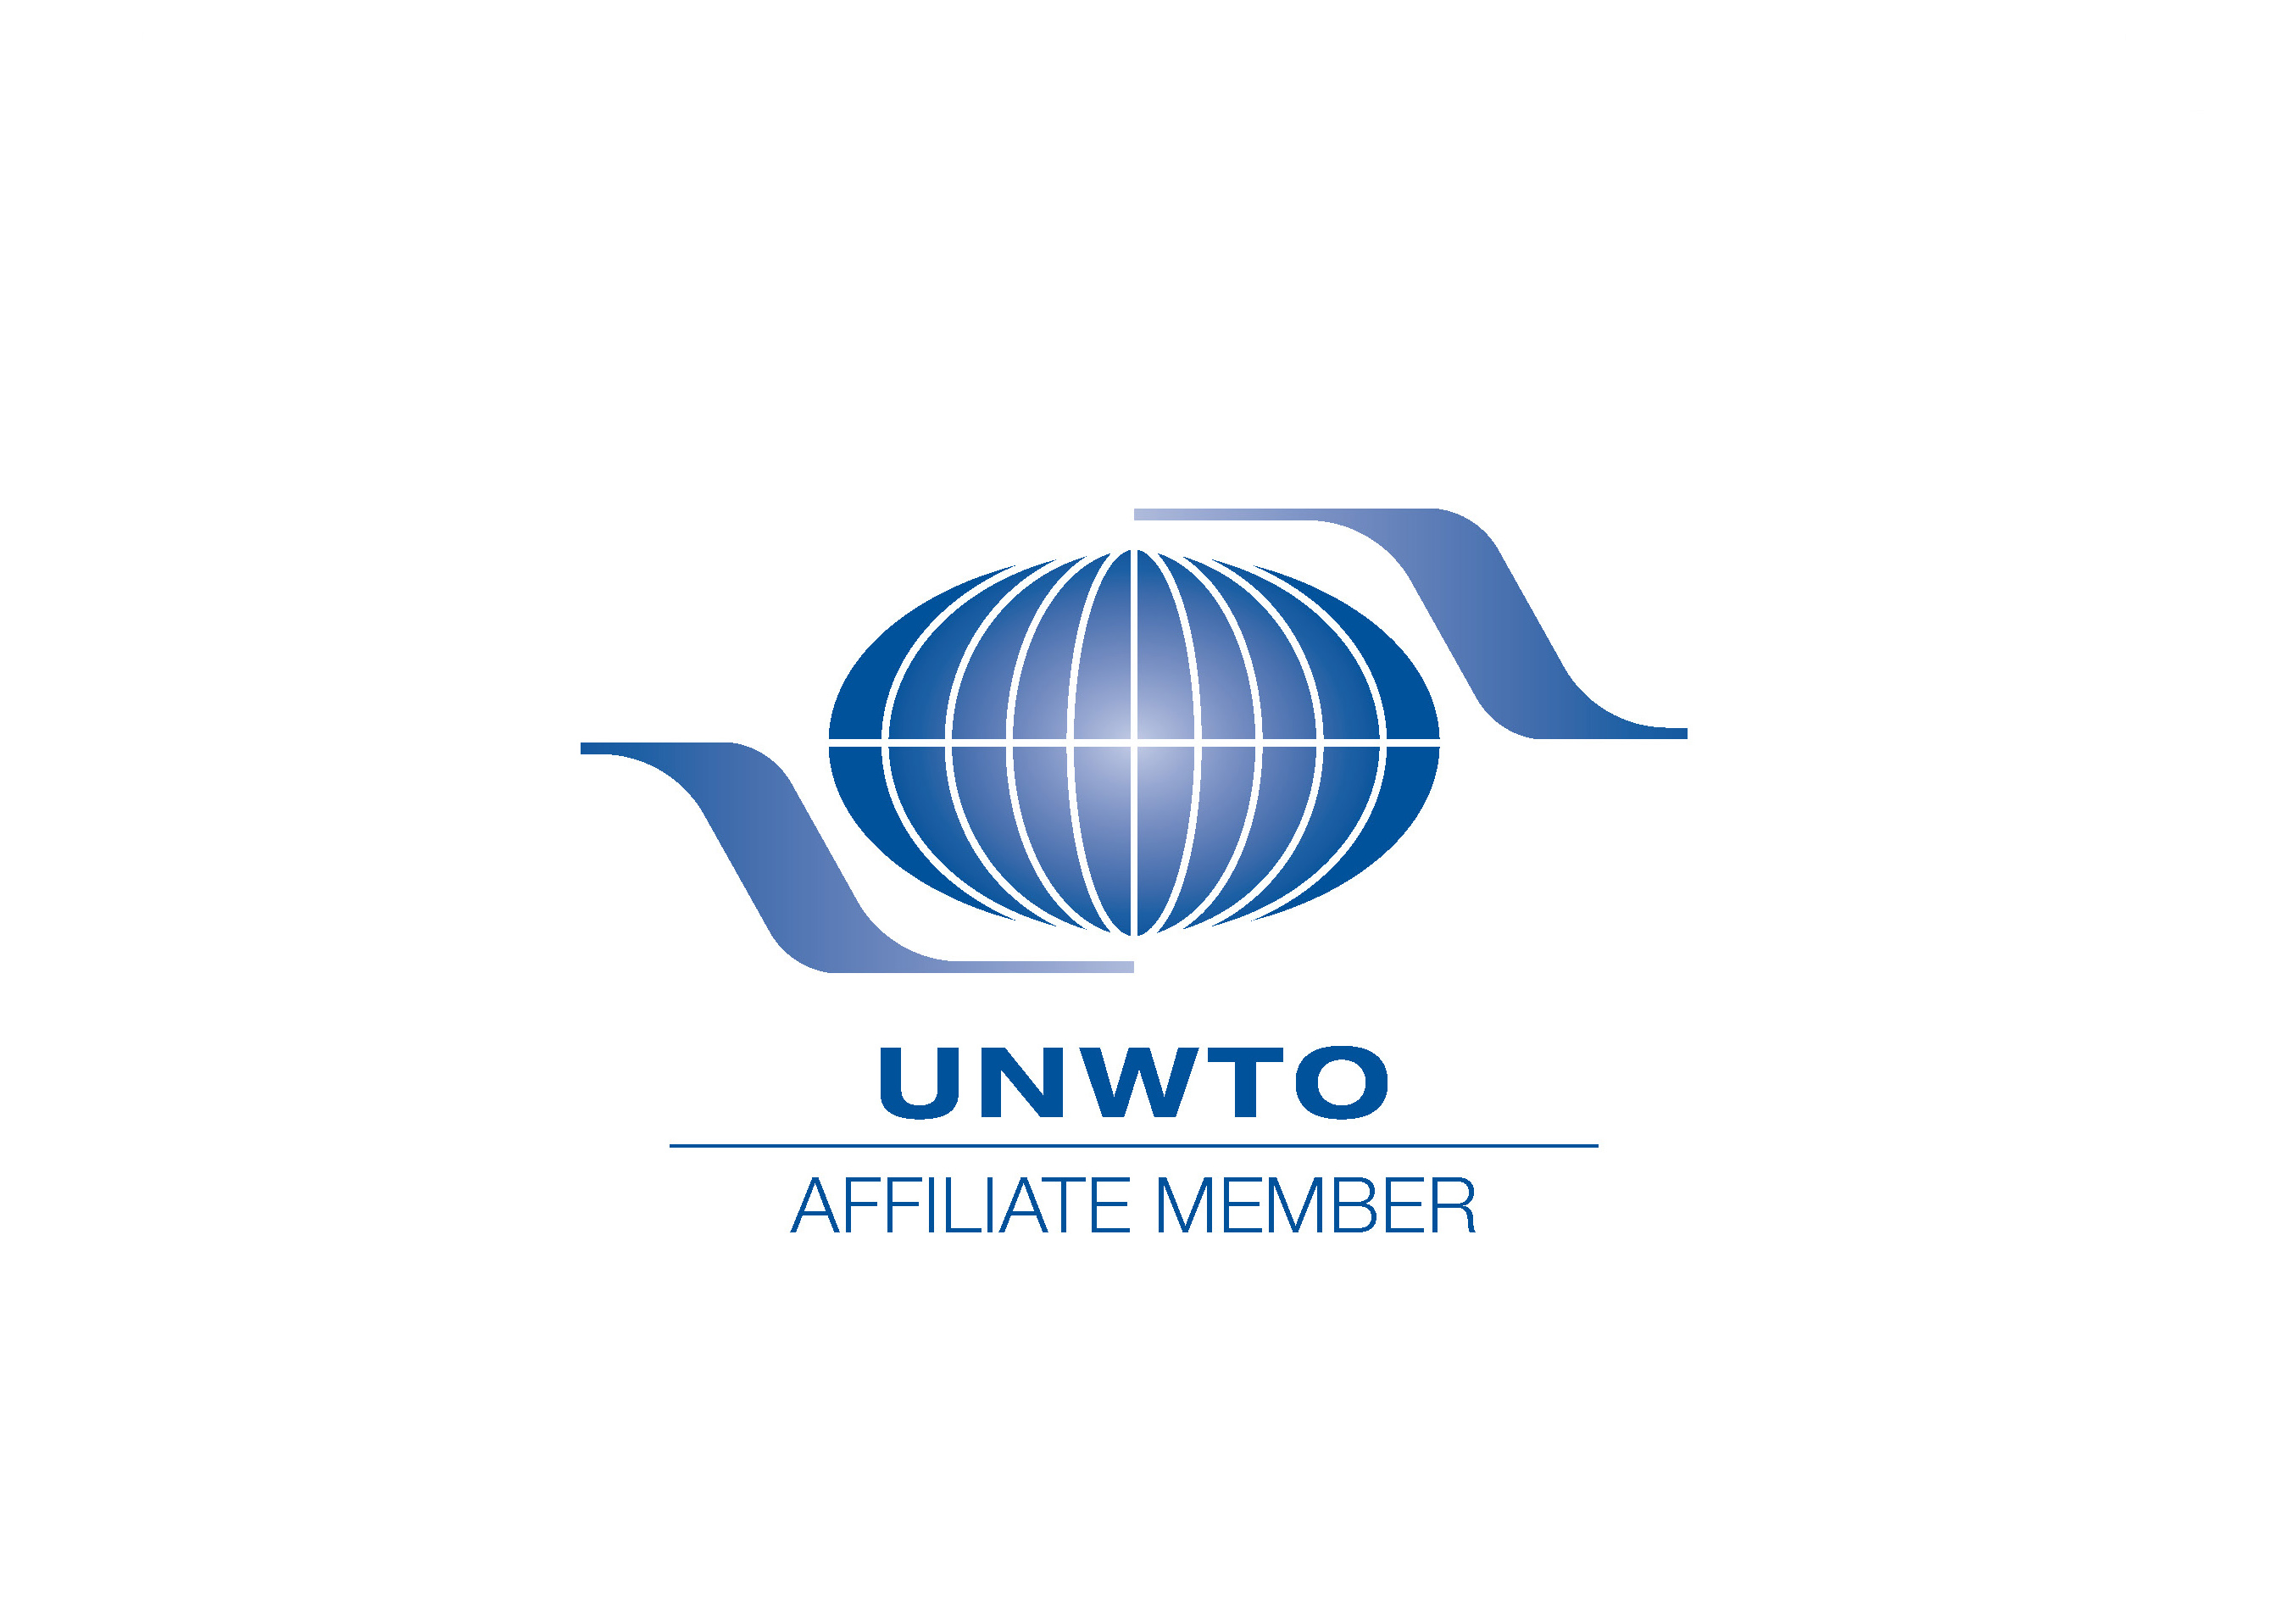 UNWTO Affiliate Member logo.jpg